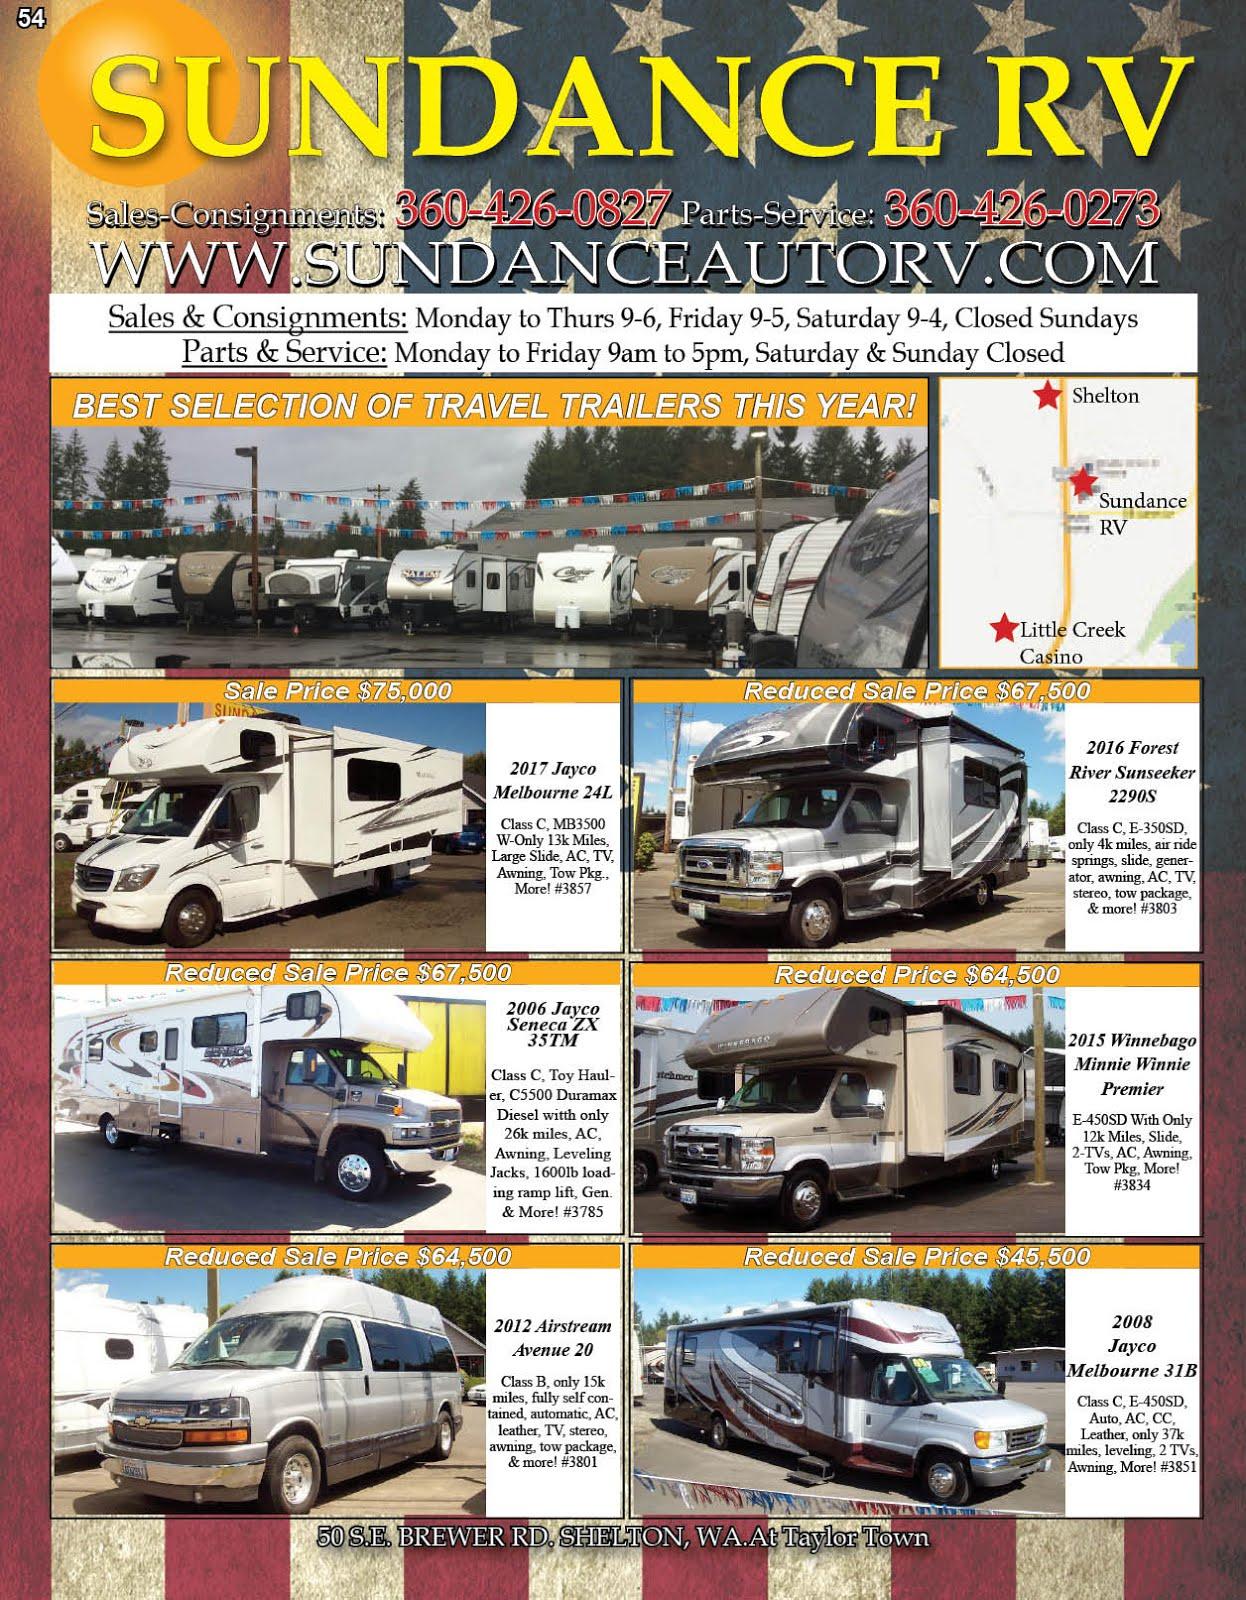 Sundance Auto & RV Center Sales & Service, Parts & Consignments